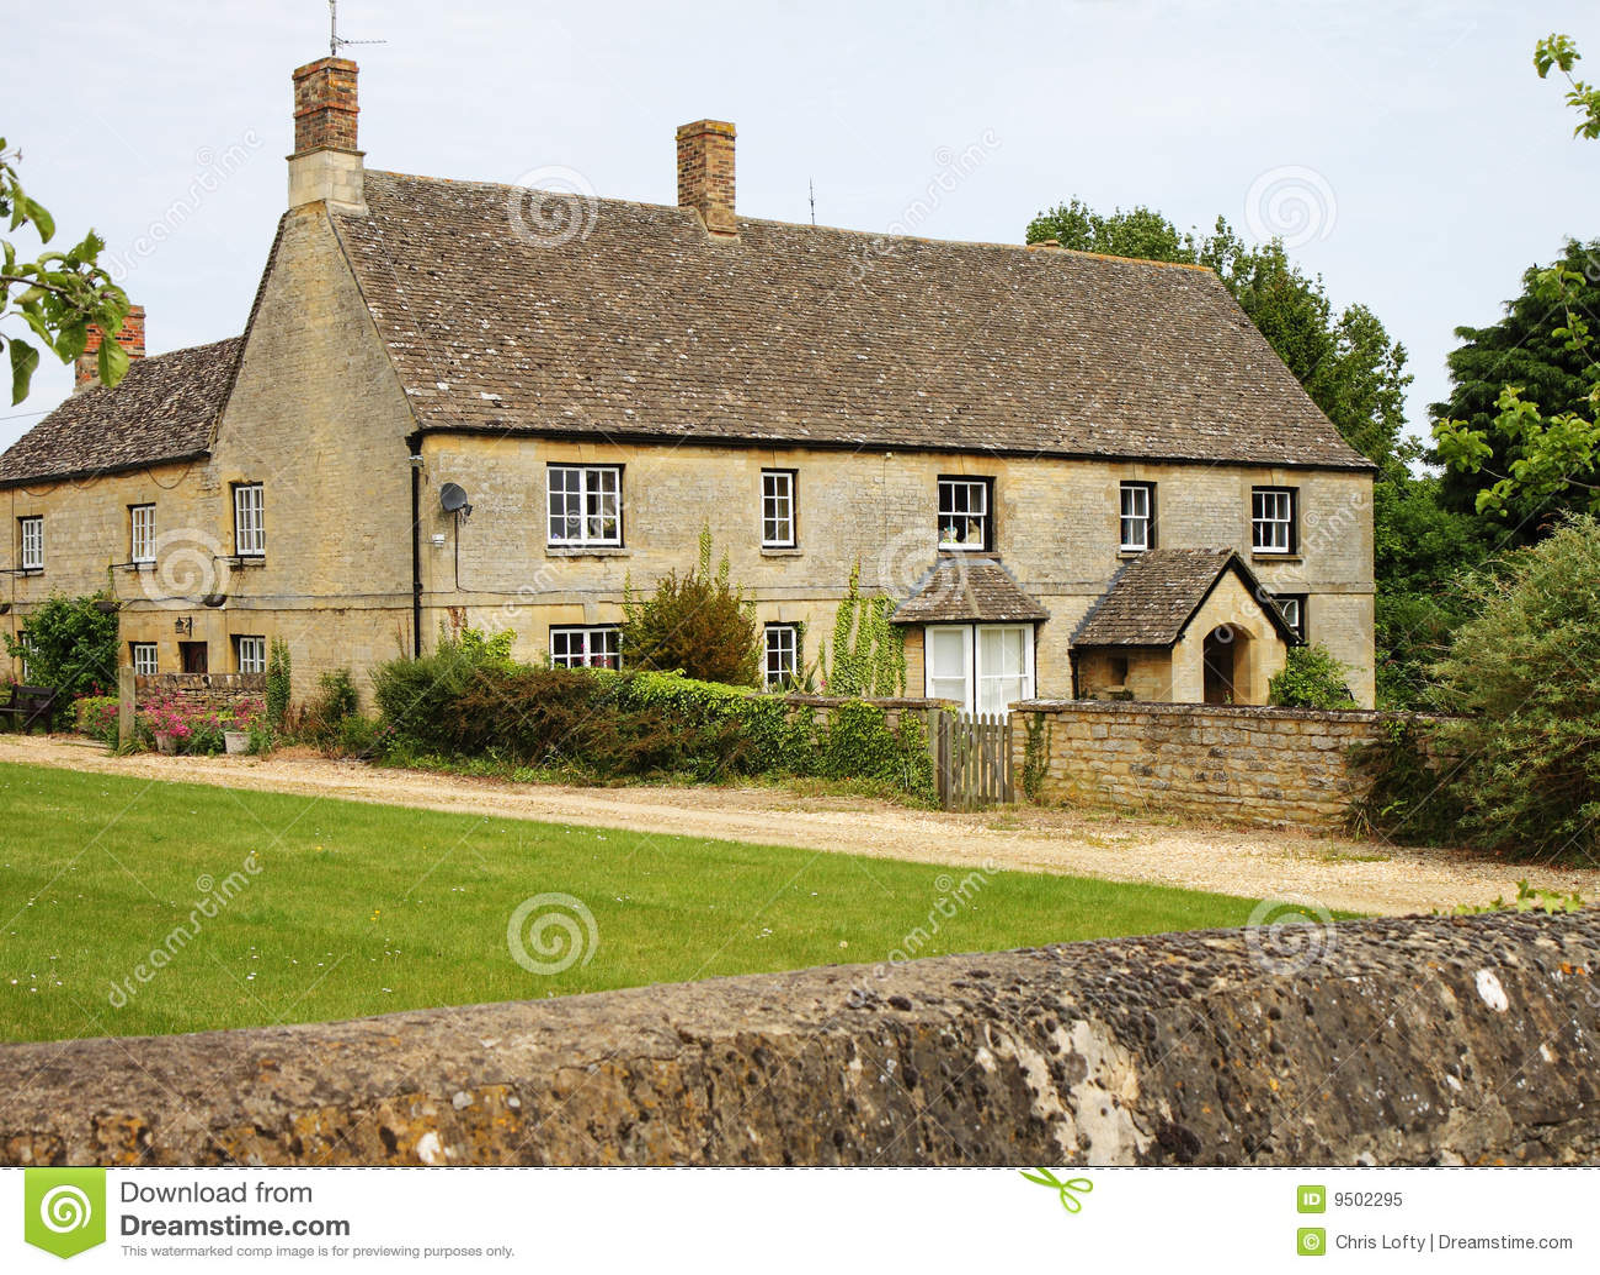 Traditional English Rural Farmhouse Royalty Free Stock Image